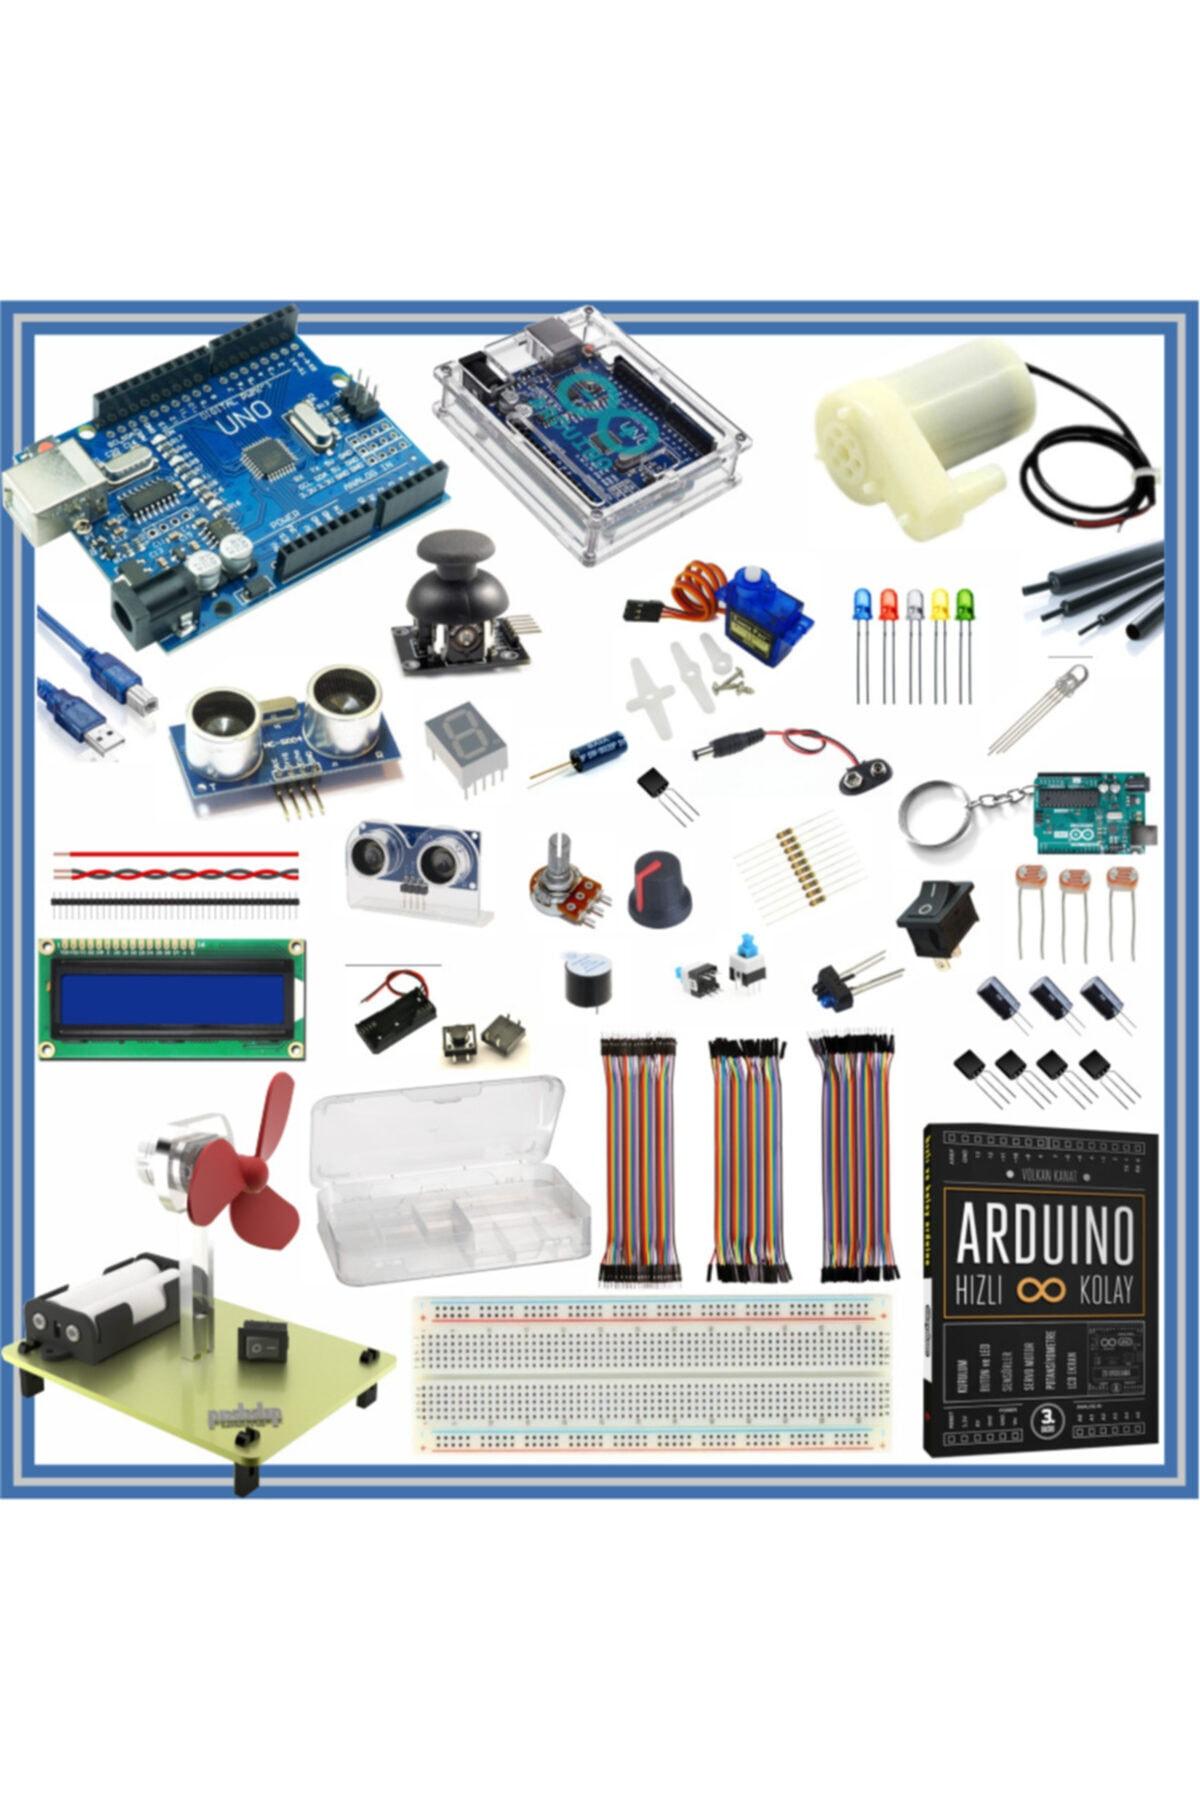 Arduino Uno R3 ( Ch340g ) Ekonomik Set 67 Parça 235 Adet 1